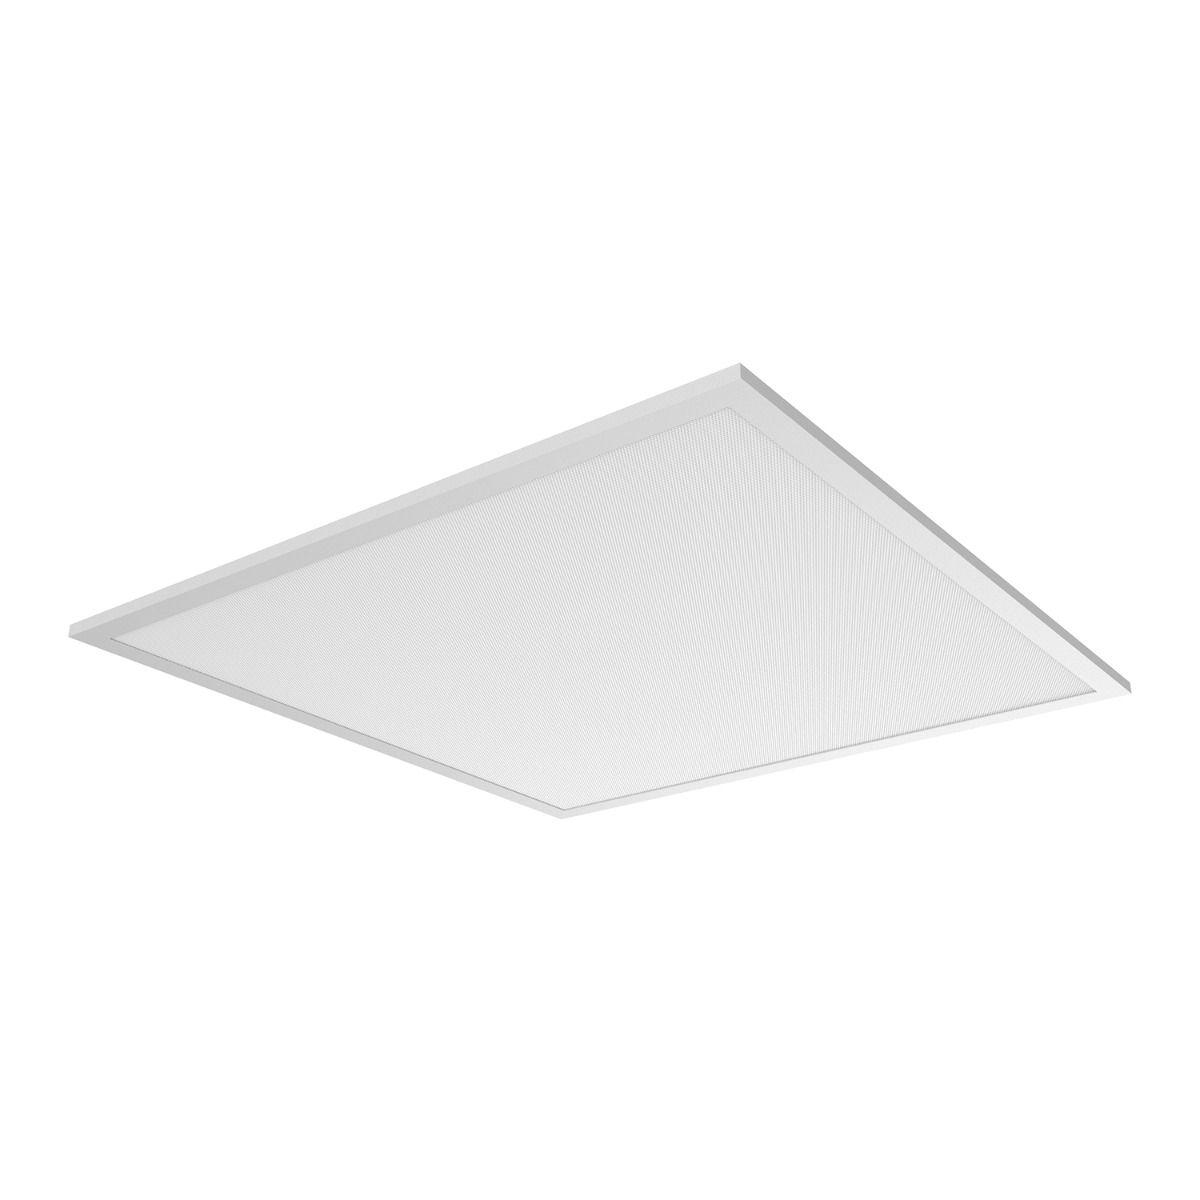 Noxion LED Panel Delta Pro V3 30W 3000K 3960lm 60x60cm UGR <19 | Warmweiß - Ersatz für 4x18W